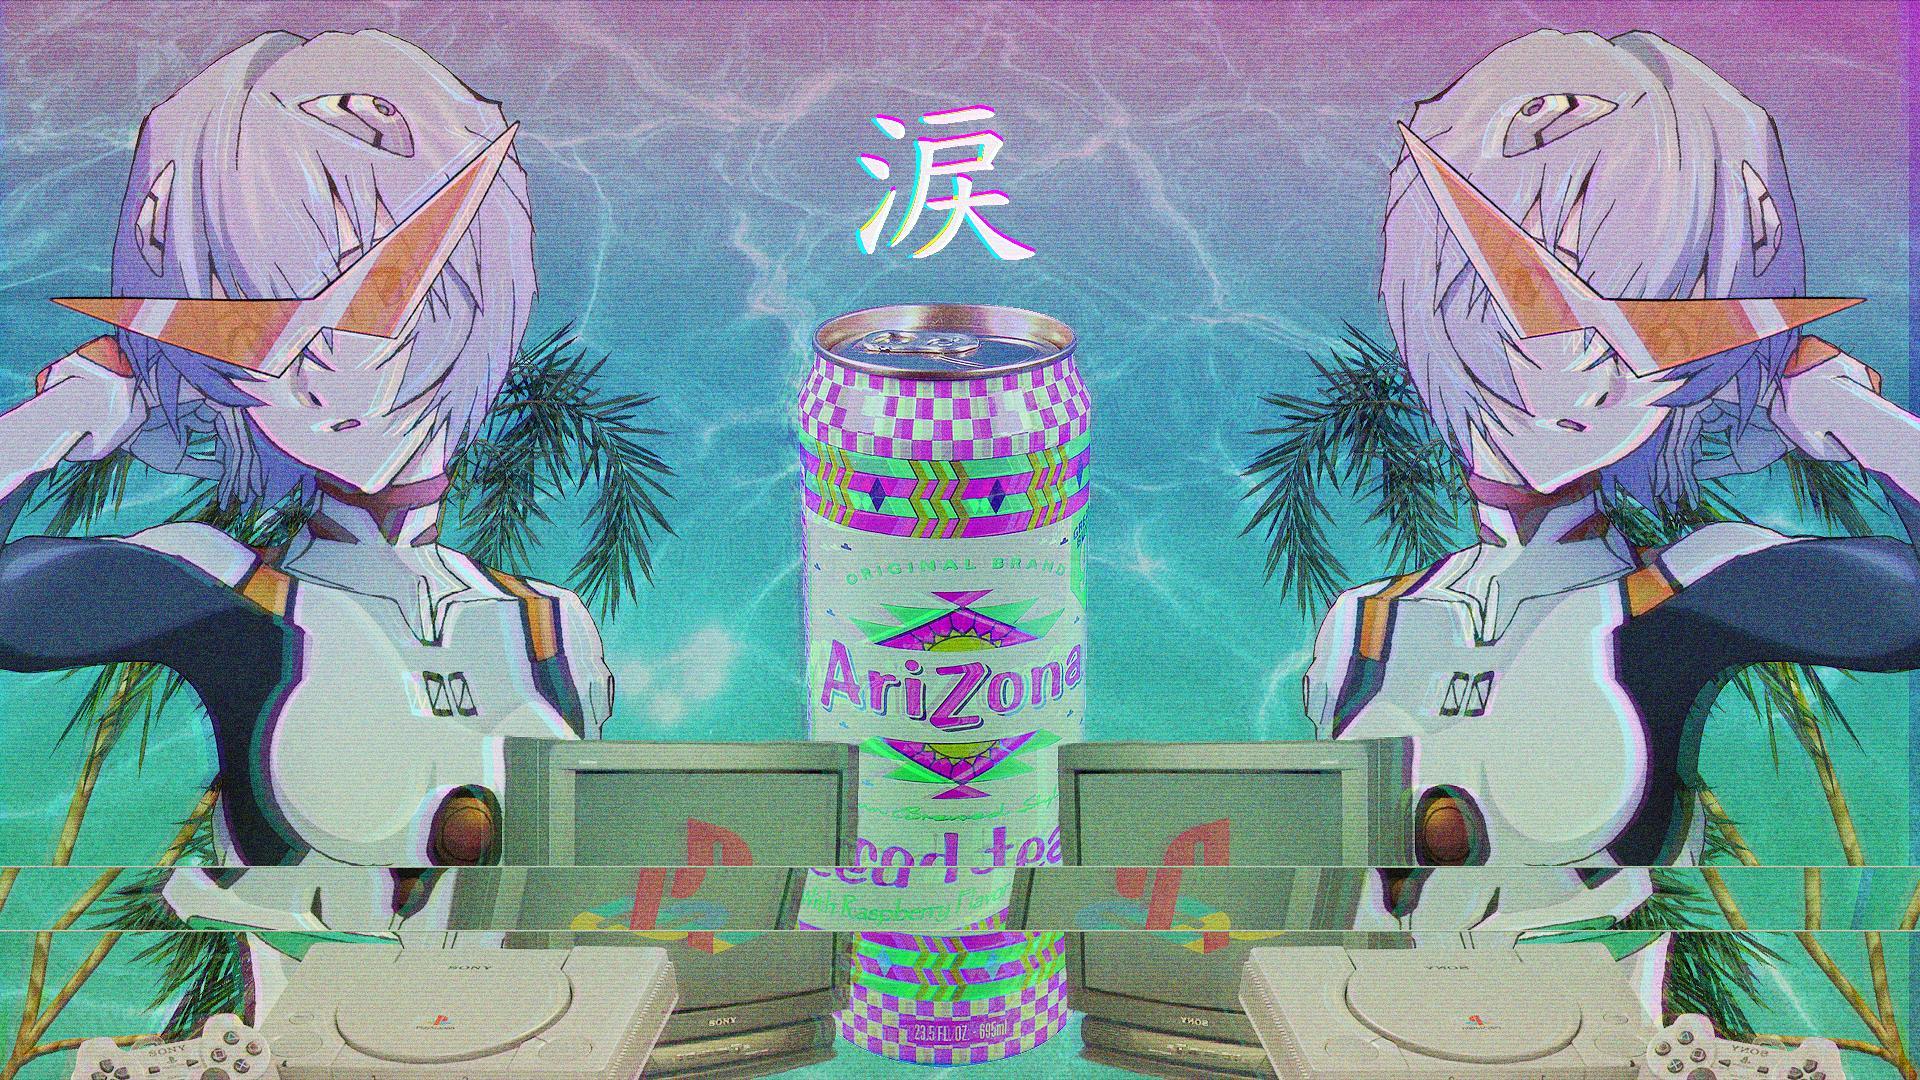 Vaporwave-arte-estetica-MTV-Tumblr-destacao